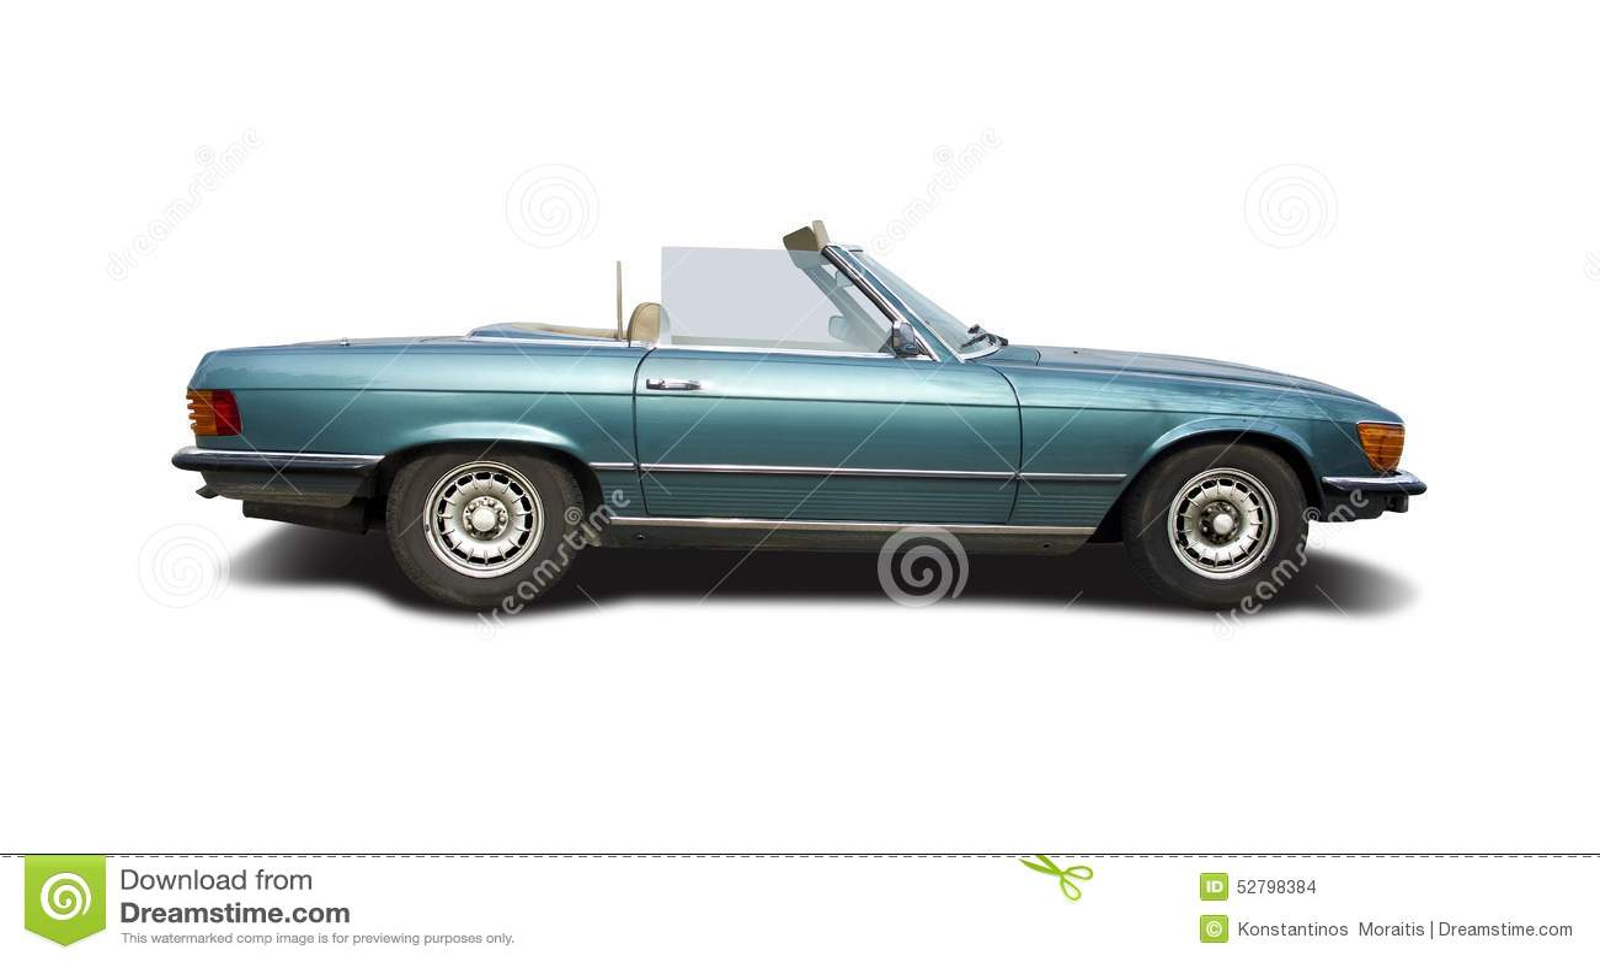 mercedes benz 280 sl cabrio stock photo image of power sport 52798384. Black Bedroom Furniture Sets. Home Design Ideas